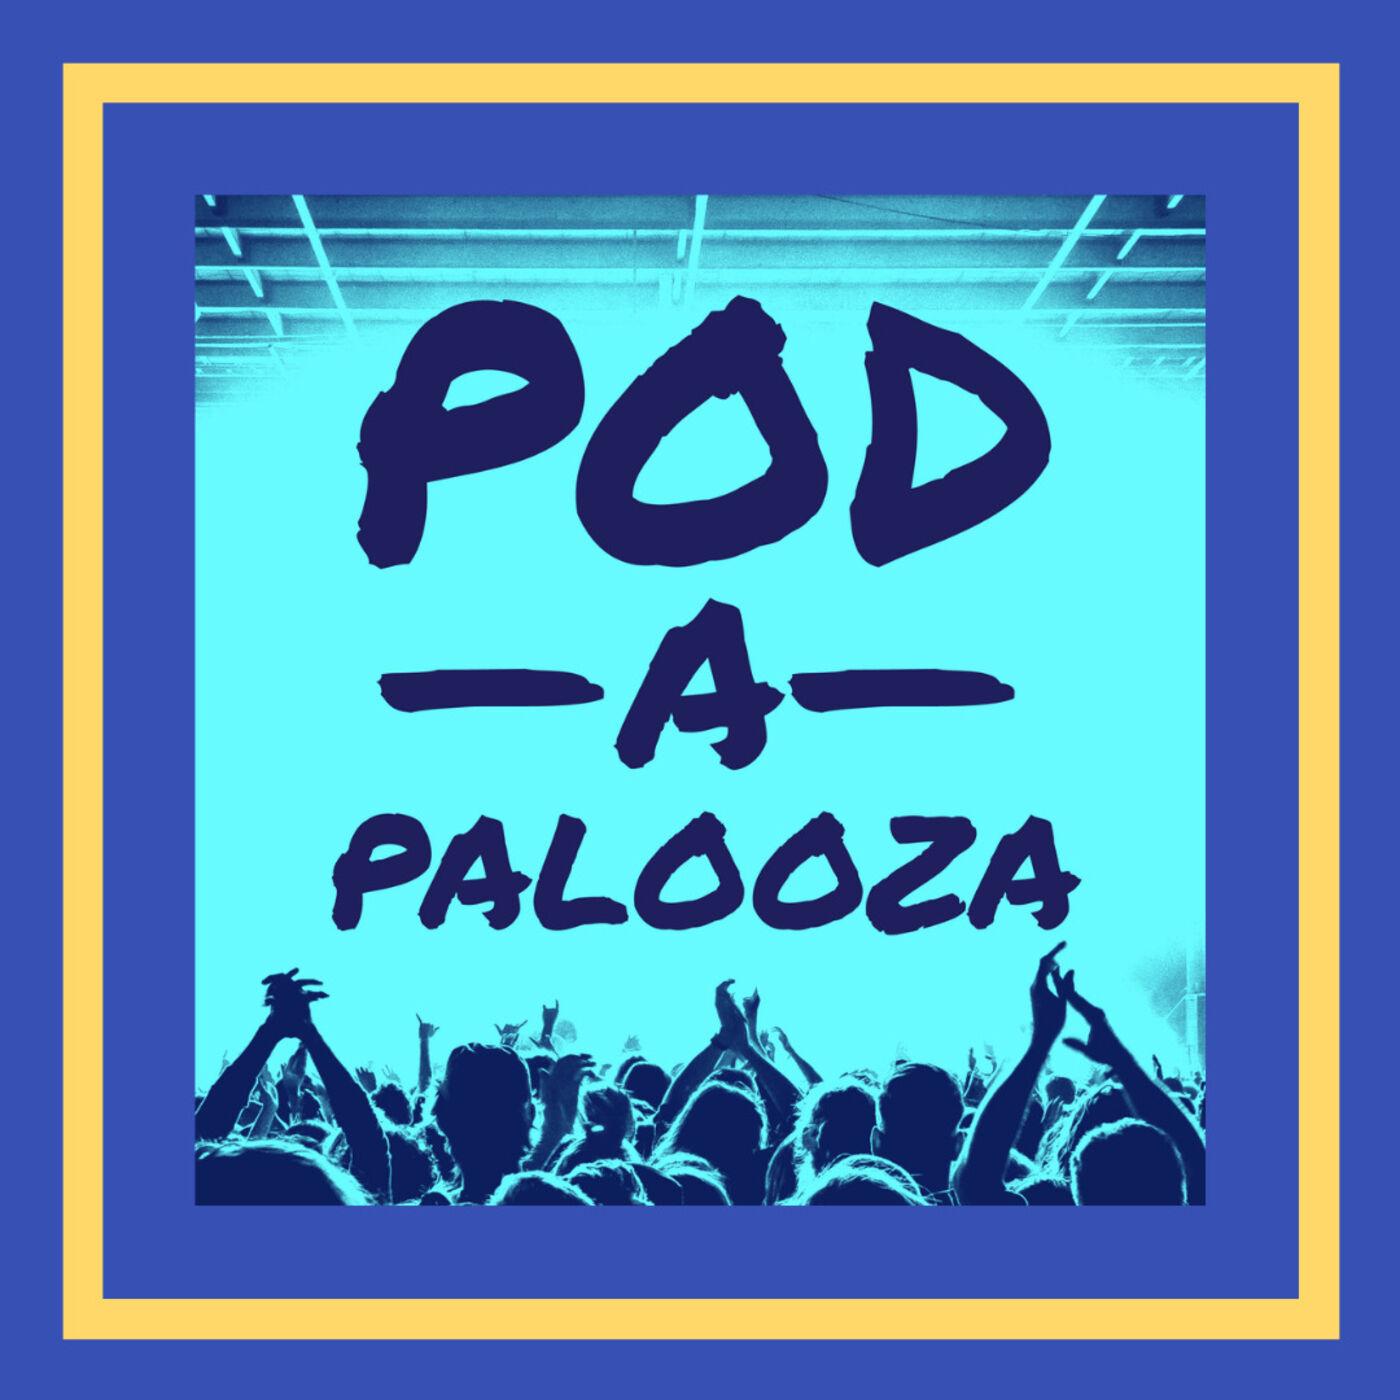 Bonus: Come to Podapalooza!